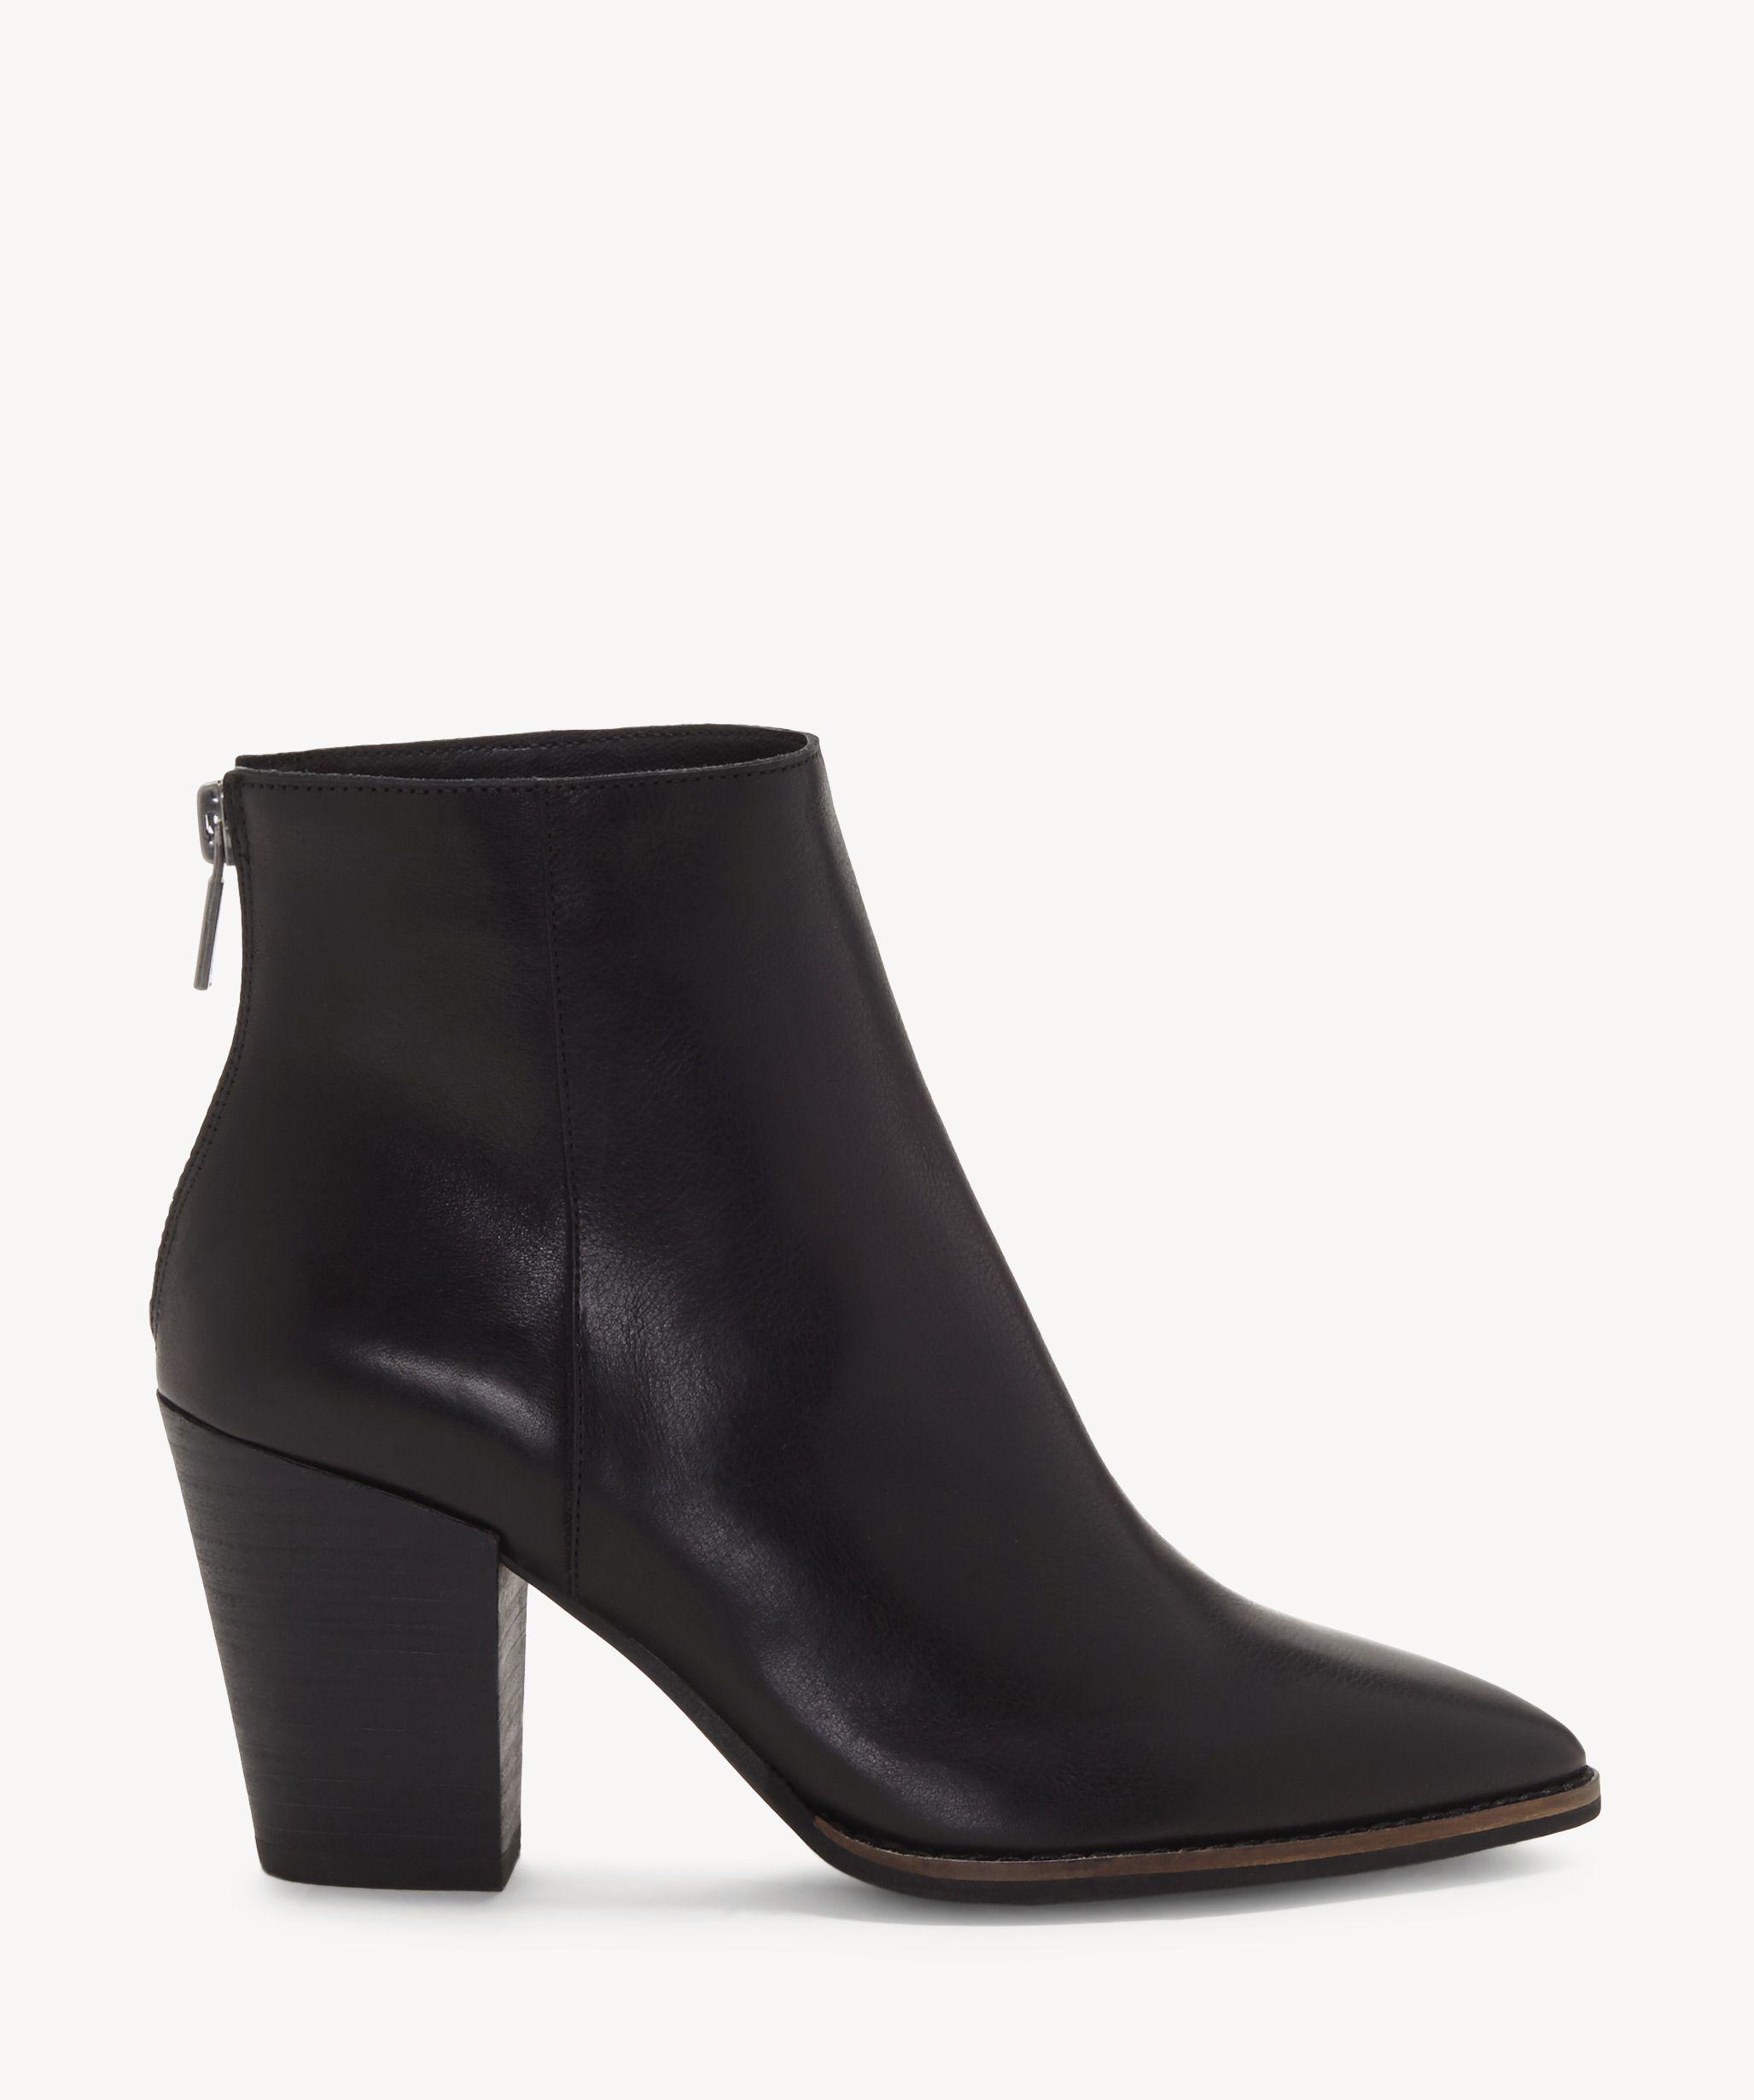 90d62b6e4f787 Lucky Brand Women's Adalan2 Block Heels Bootie Black   Size 6.5 Hair Calf  Fur From Sole Society